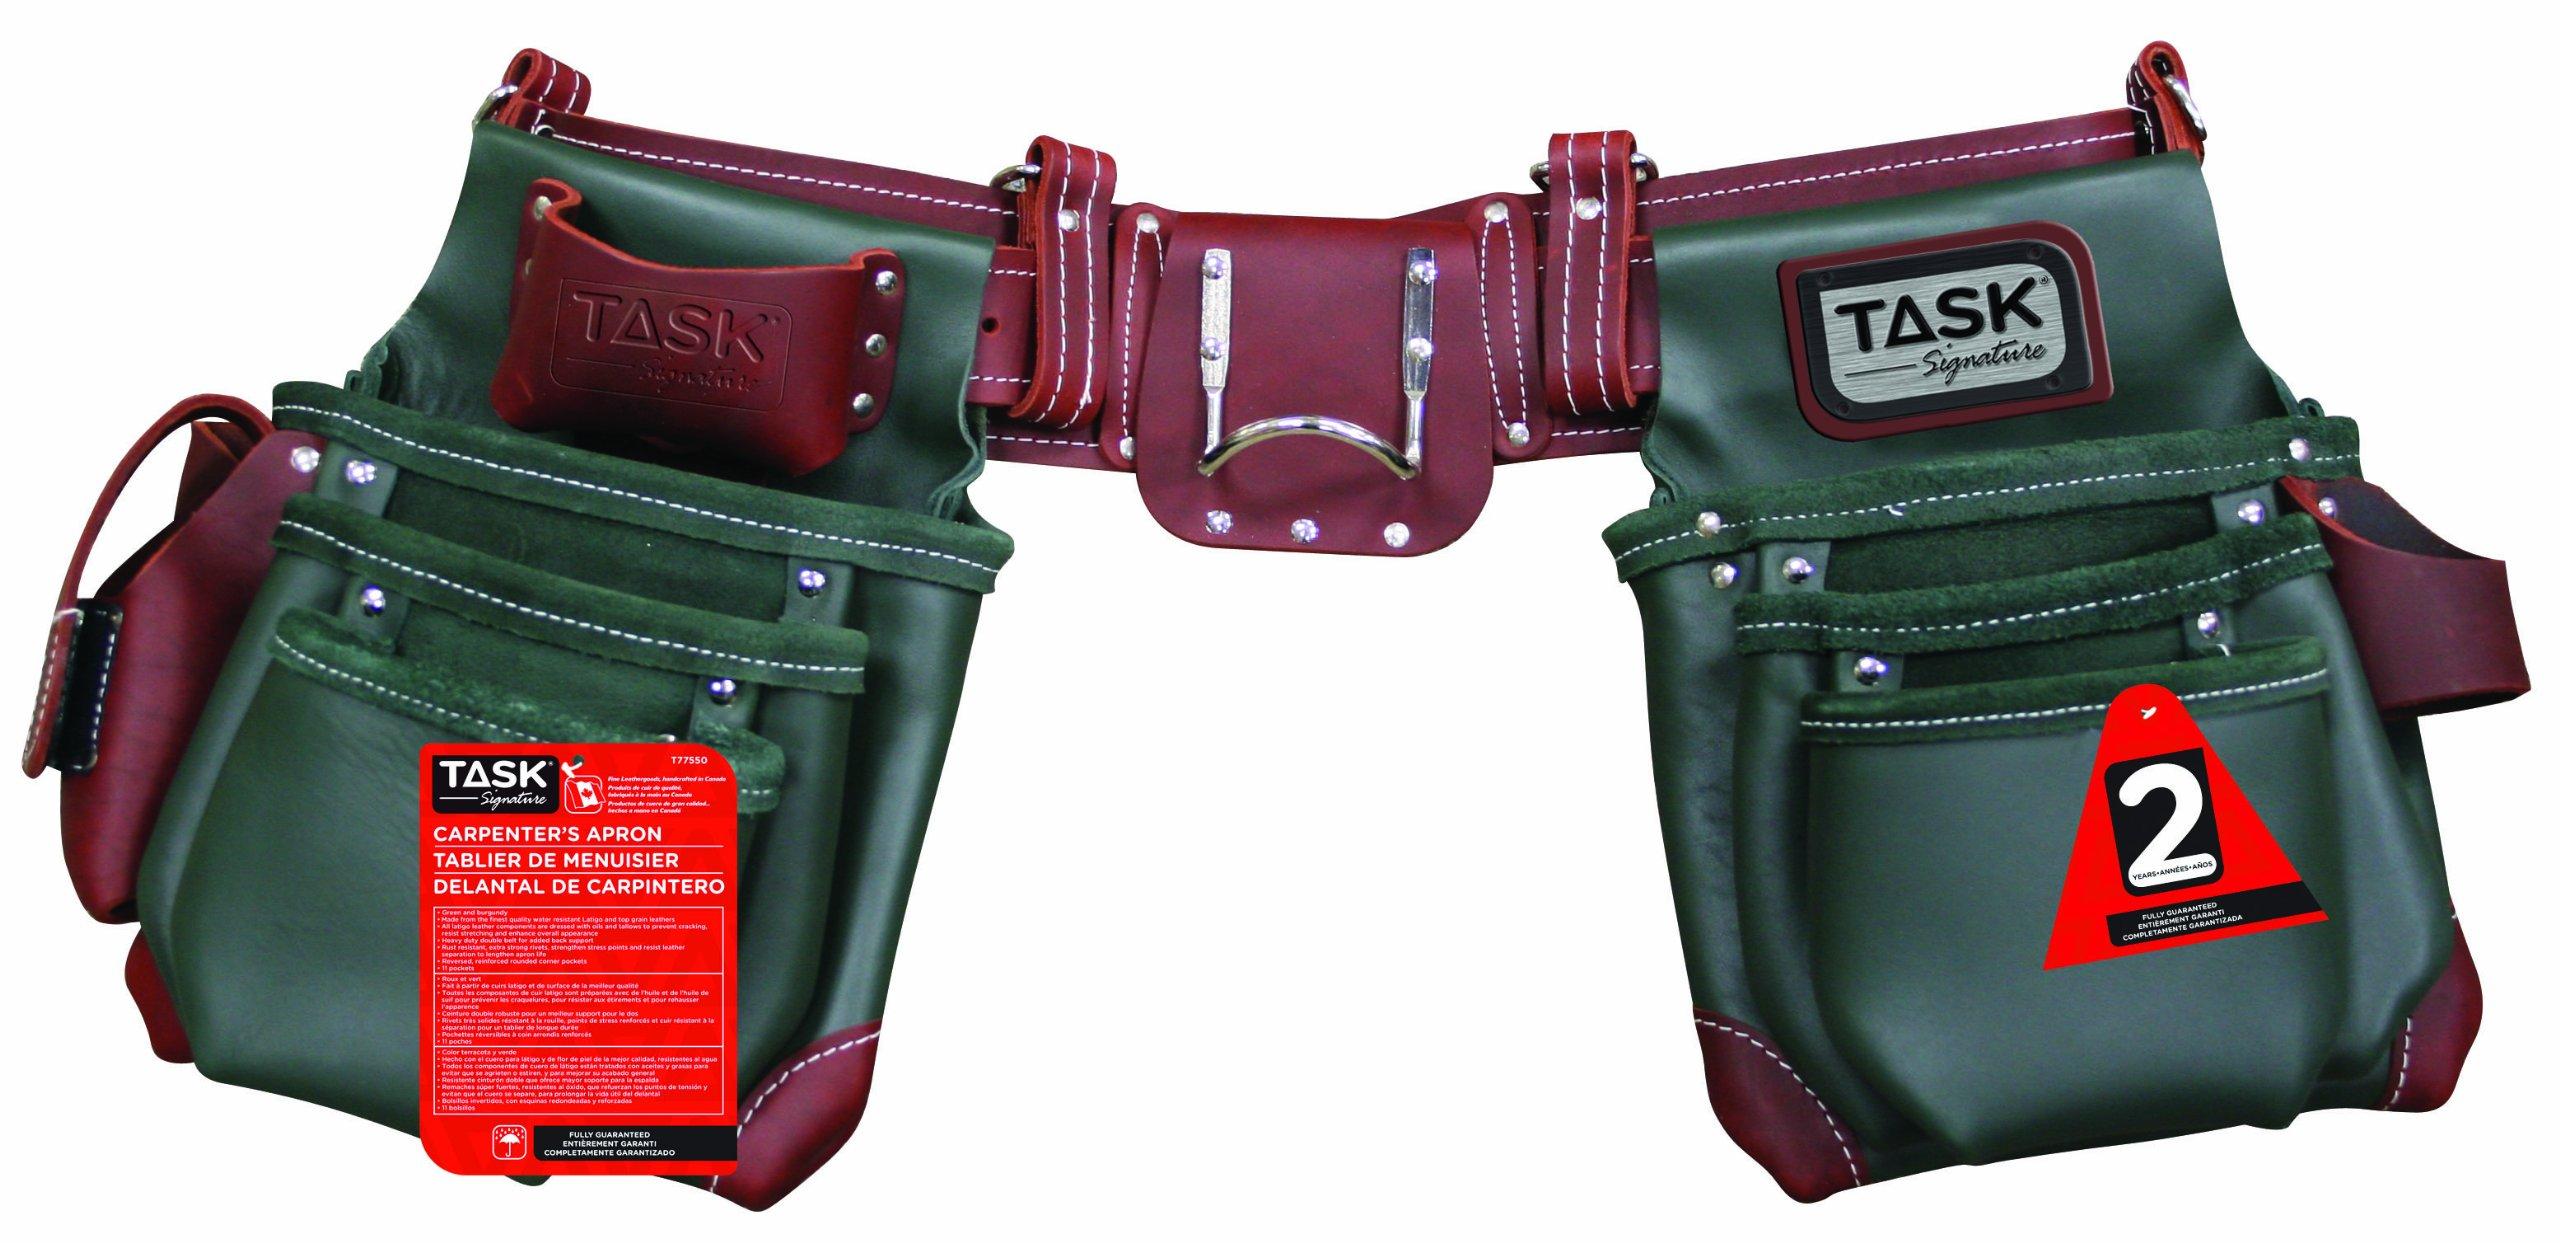 Task Tools T77550 Component Work Belt System, Green and Burgundy, 11-Pocket